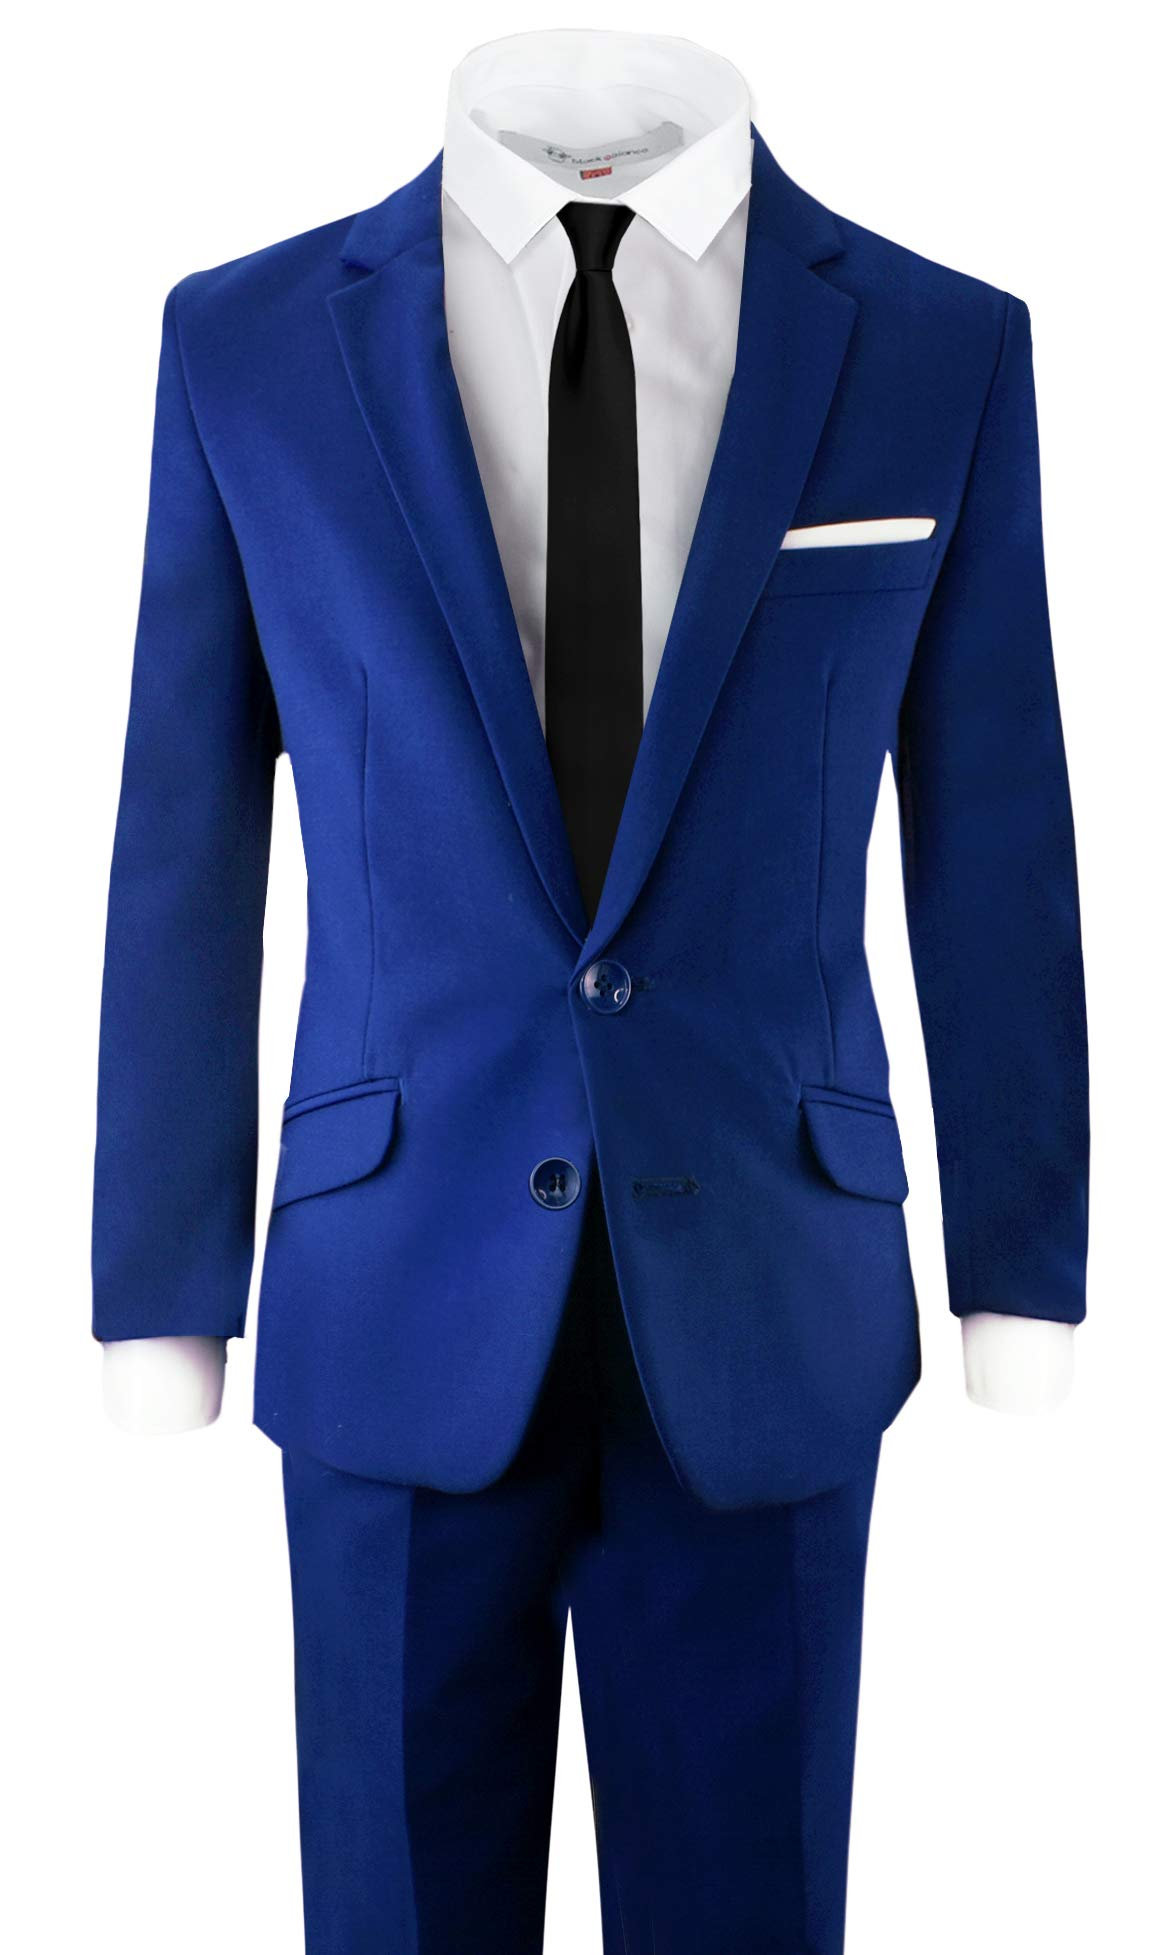 Black n Bianco Signature Boys' Slim Fit Suit Complete Outfit (7, Blue) by Black n Bianco (Image #1)